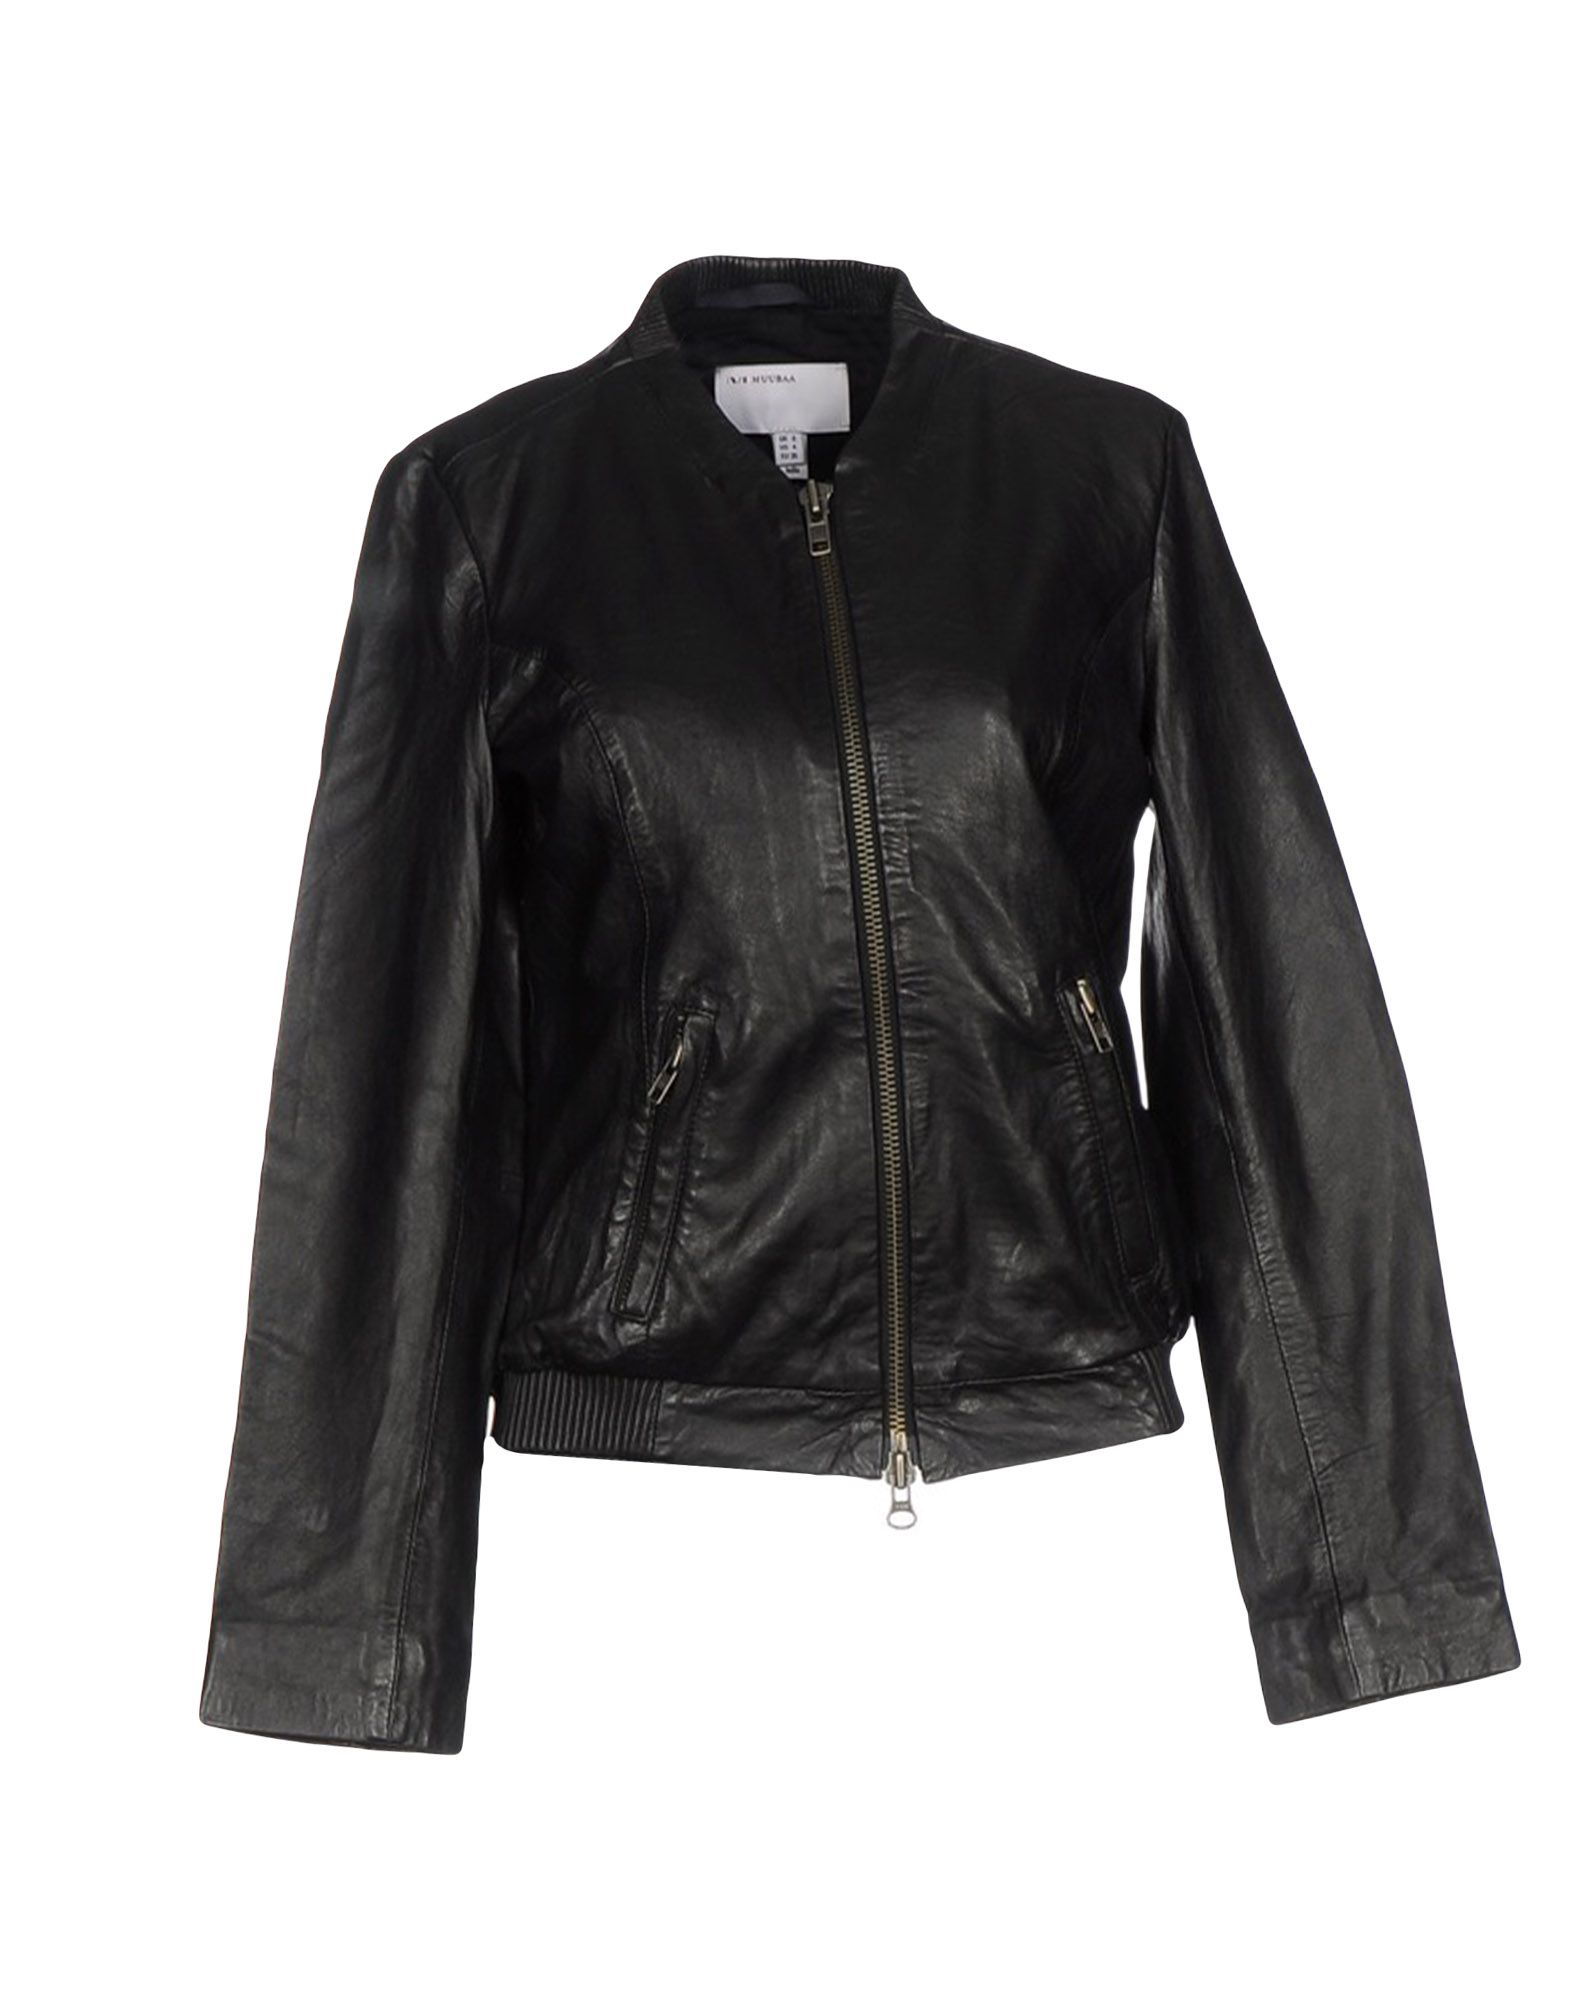 MUUBAA Damen Jacke Farbe Schwarz Größe 3